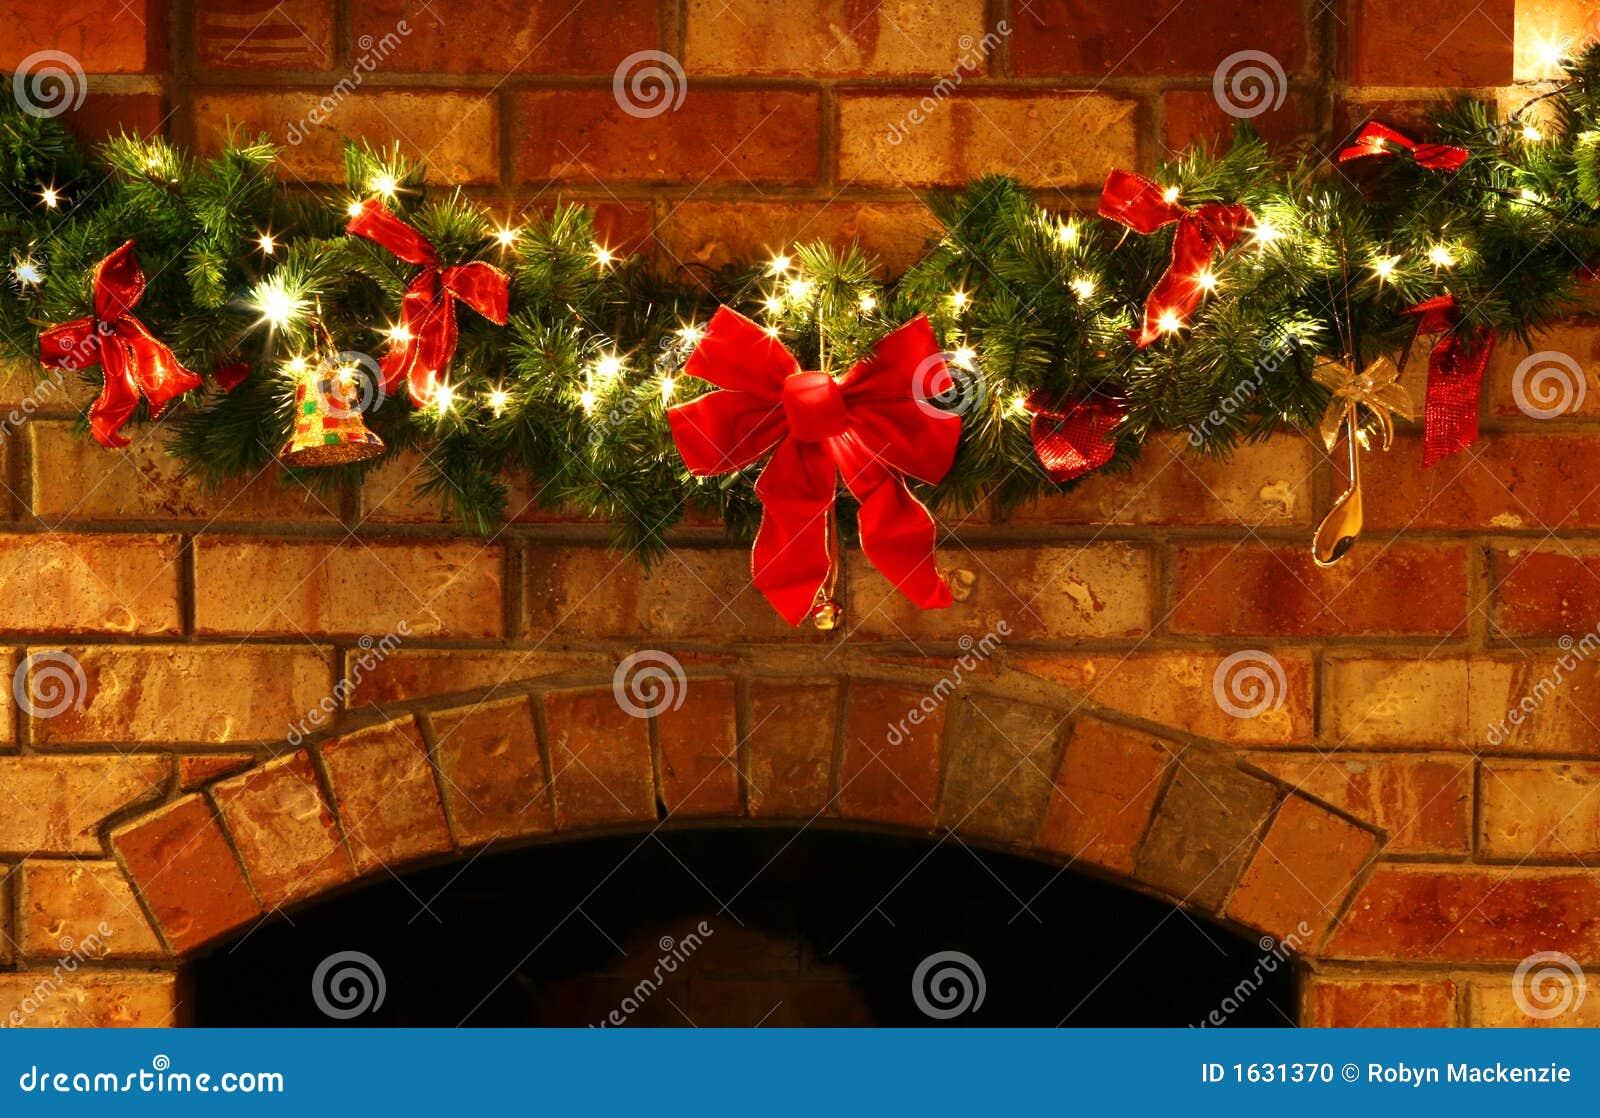 Christmas garland with lights stock photo image 1631370 for Christmas garland on fireplace